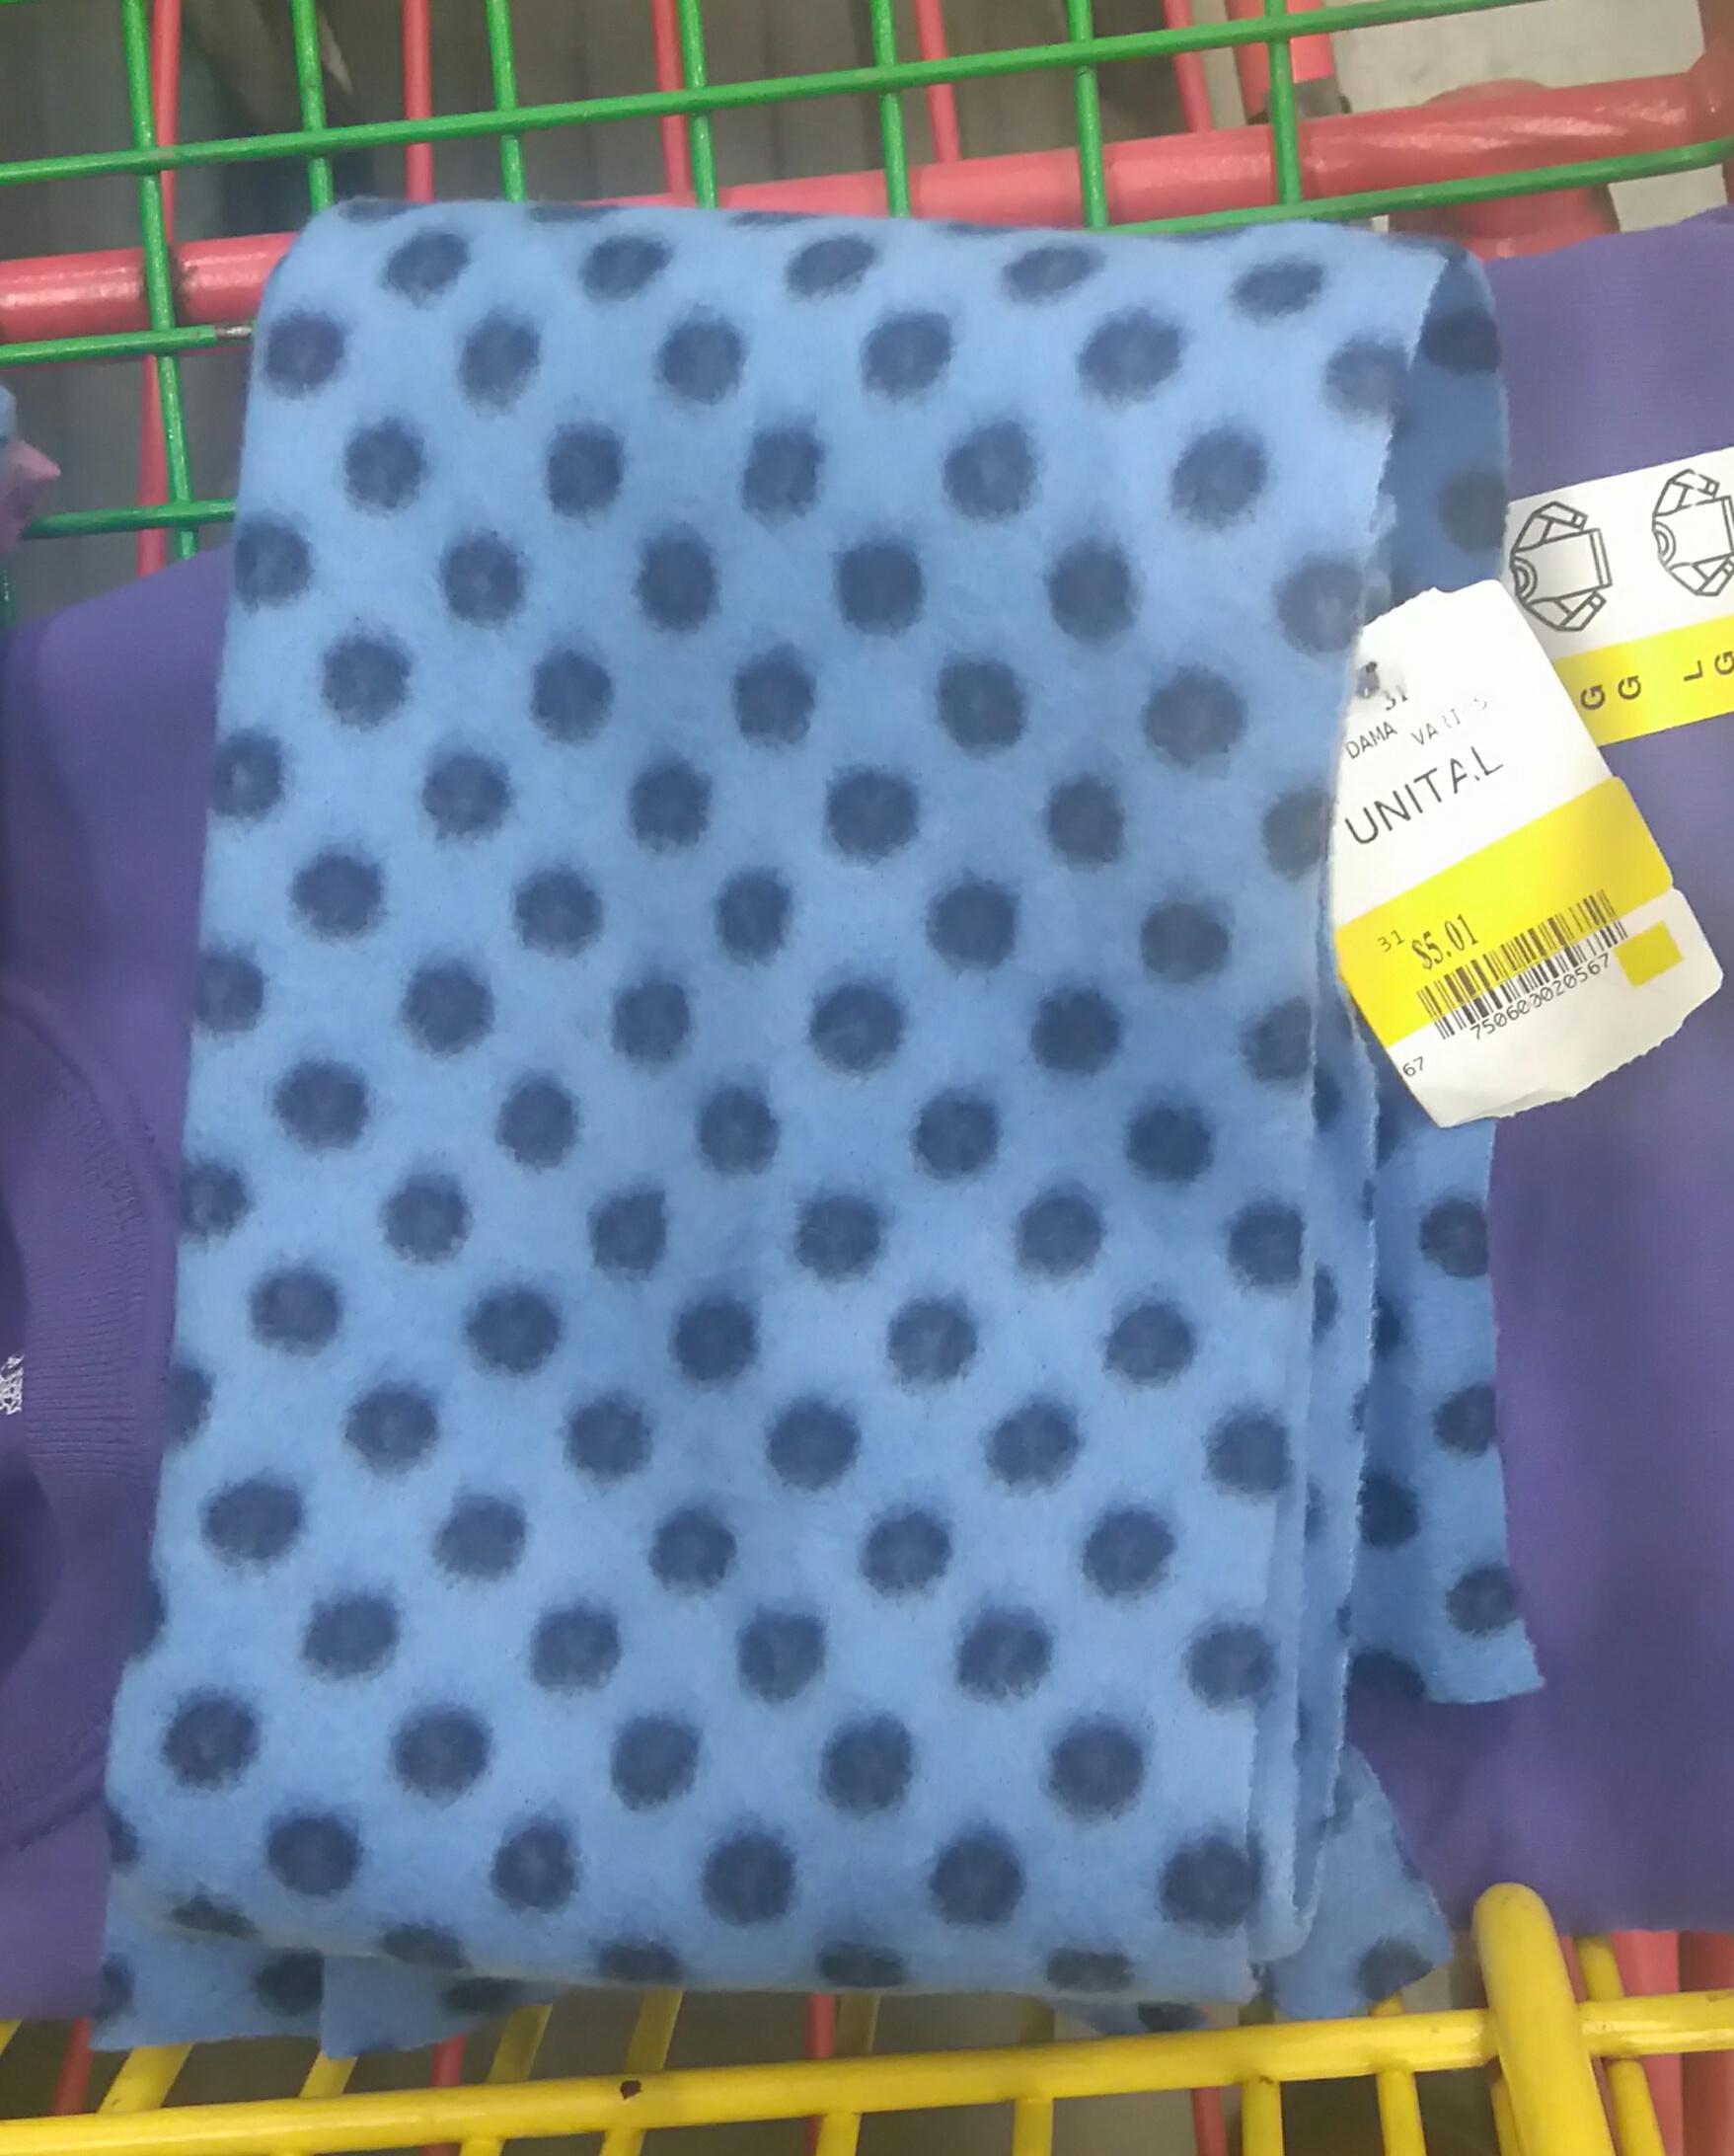 Bodega Aurrerá: Bufanda para Dama en $5.01